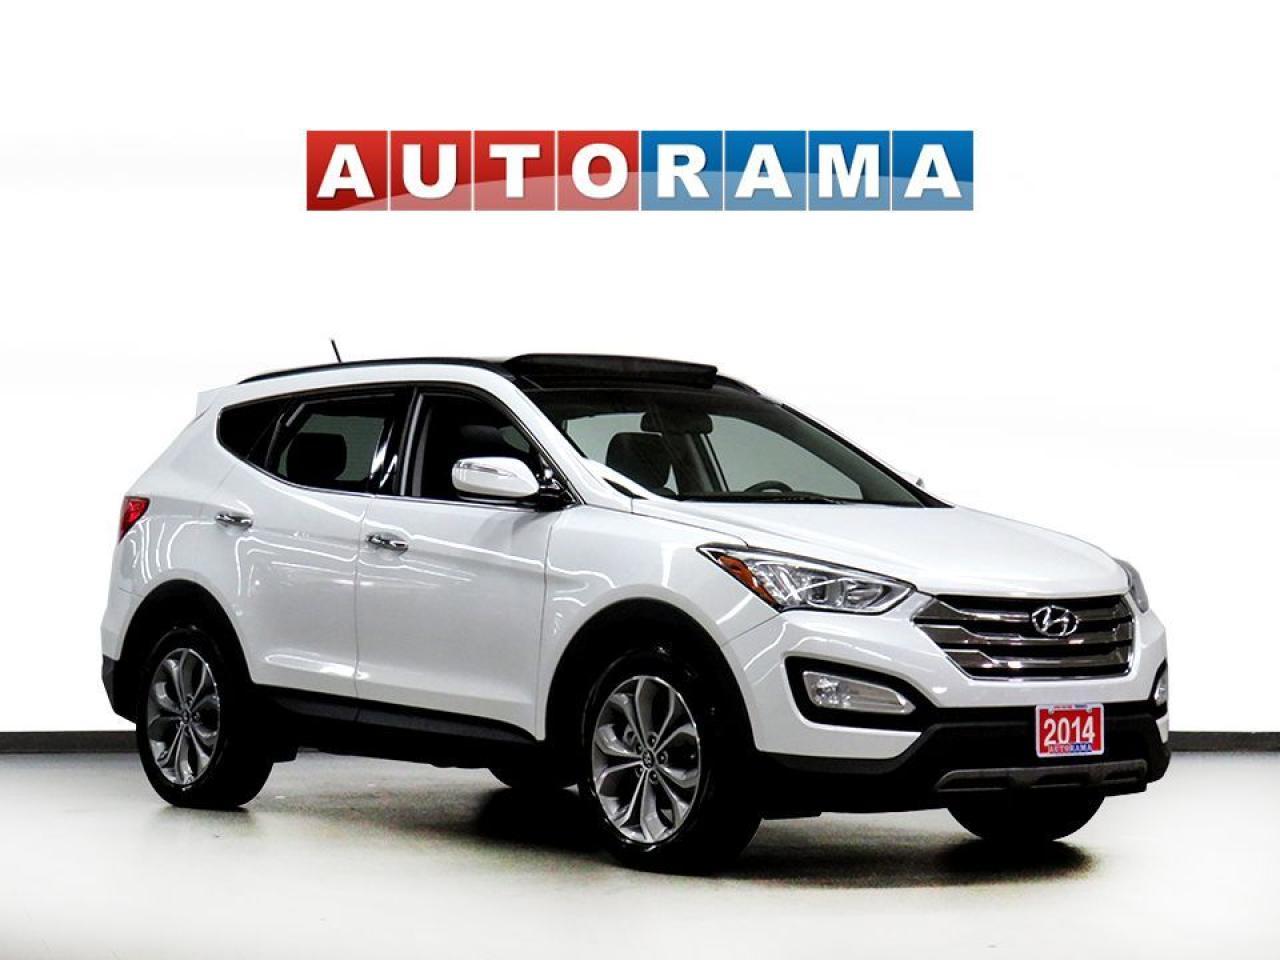 2014 Hyundai Santa Fe LIMITED LEATHER PAN SUNROOF NAVI BACK UP CAM AWD